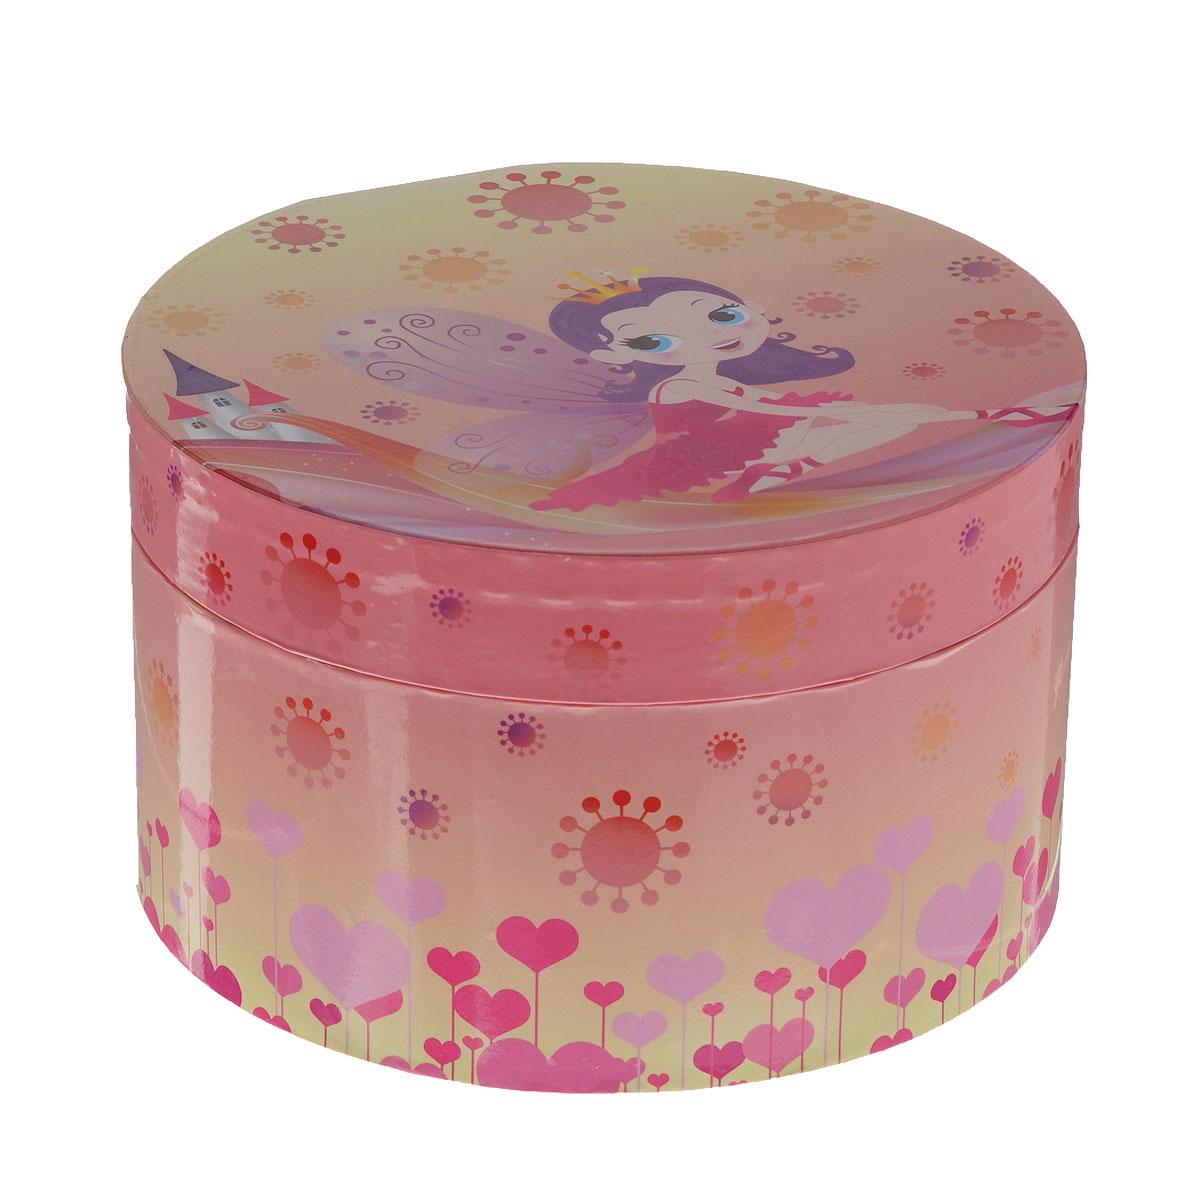 Музыкальная шкатулка Jakos Принцесса, цвет: розовый, желтый